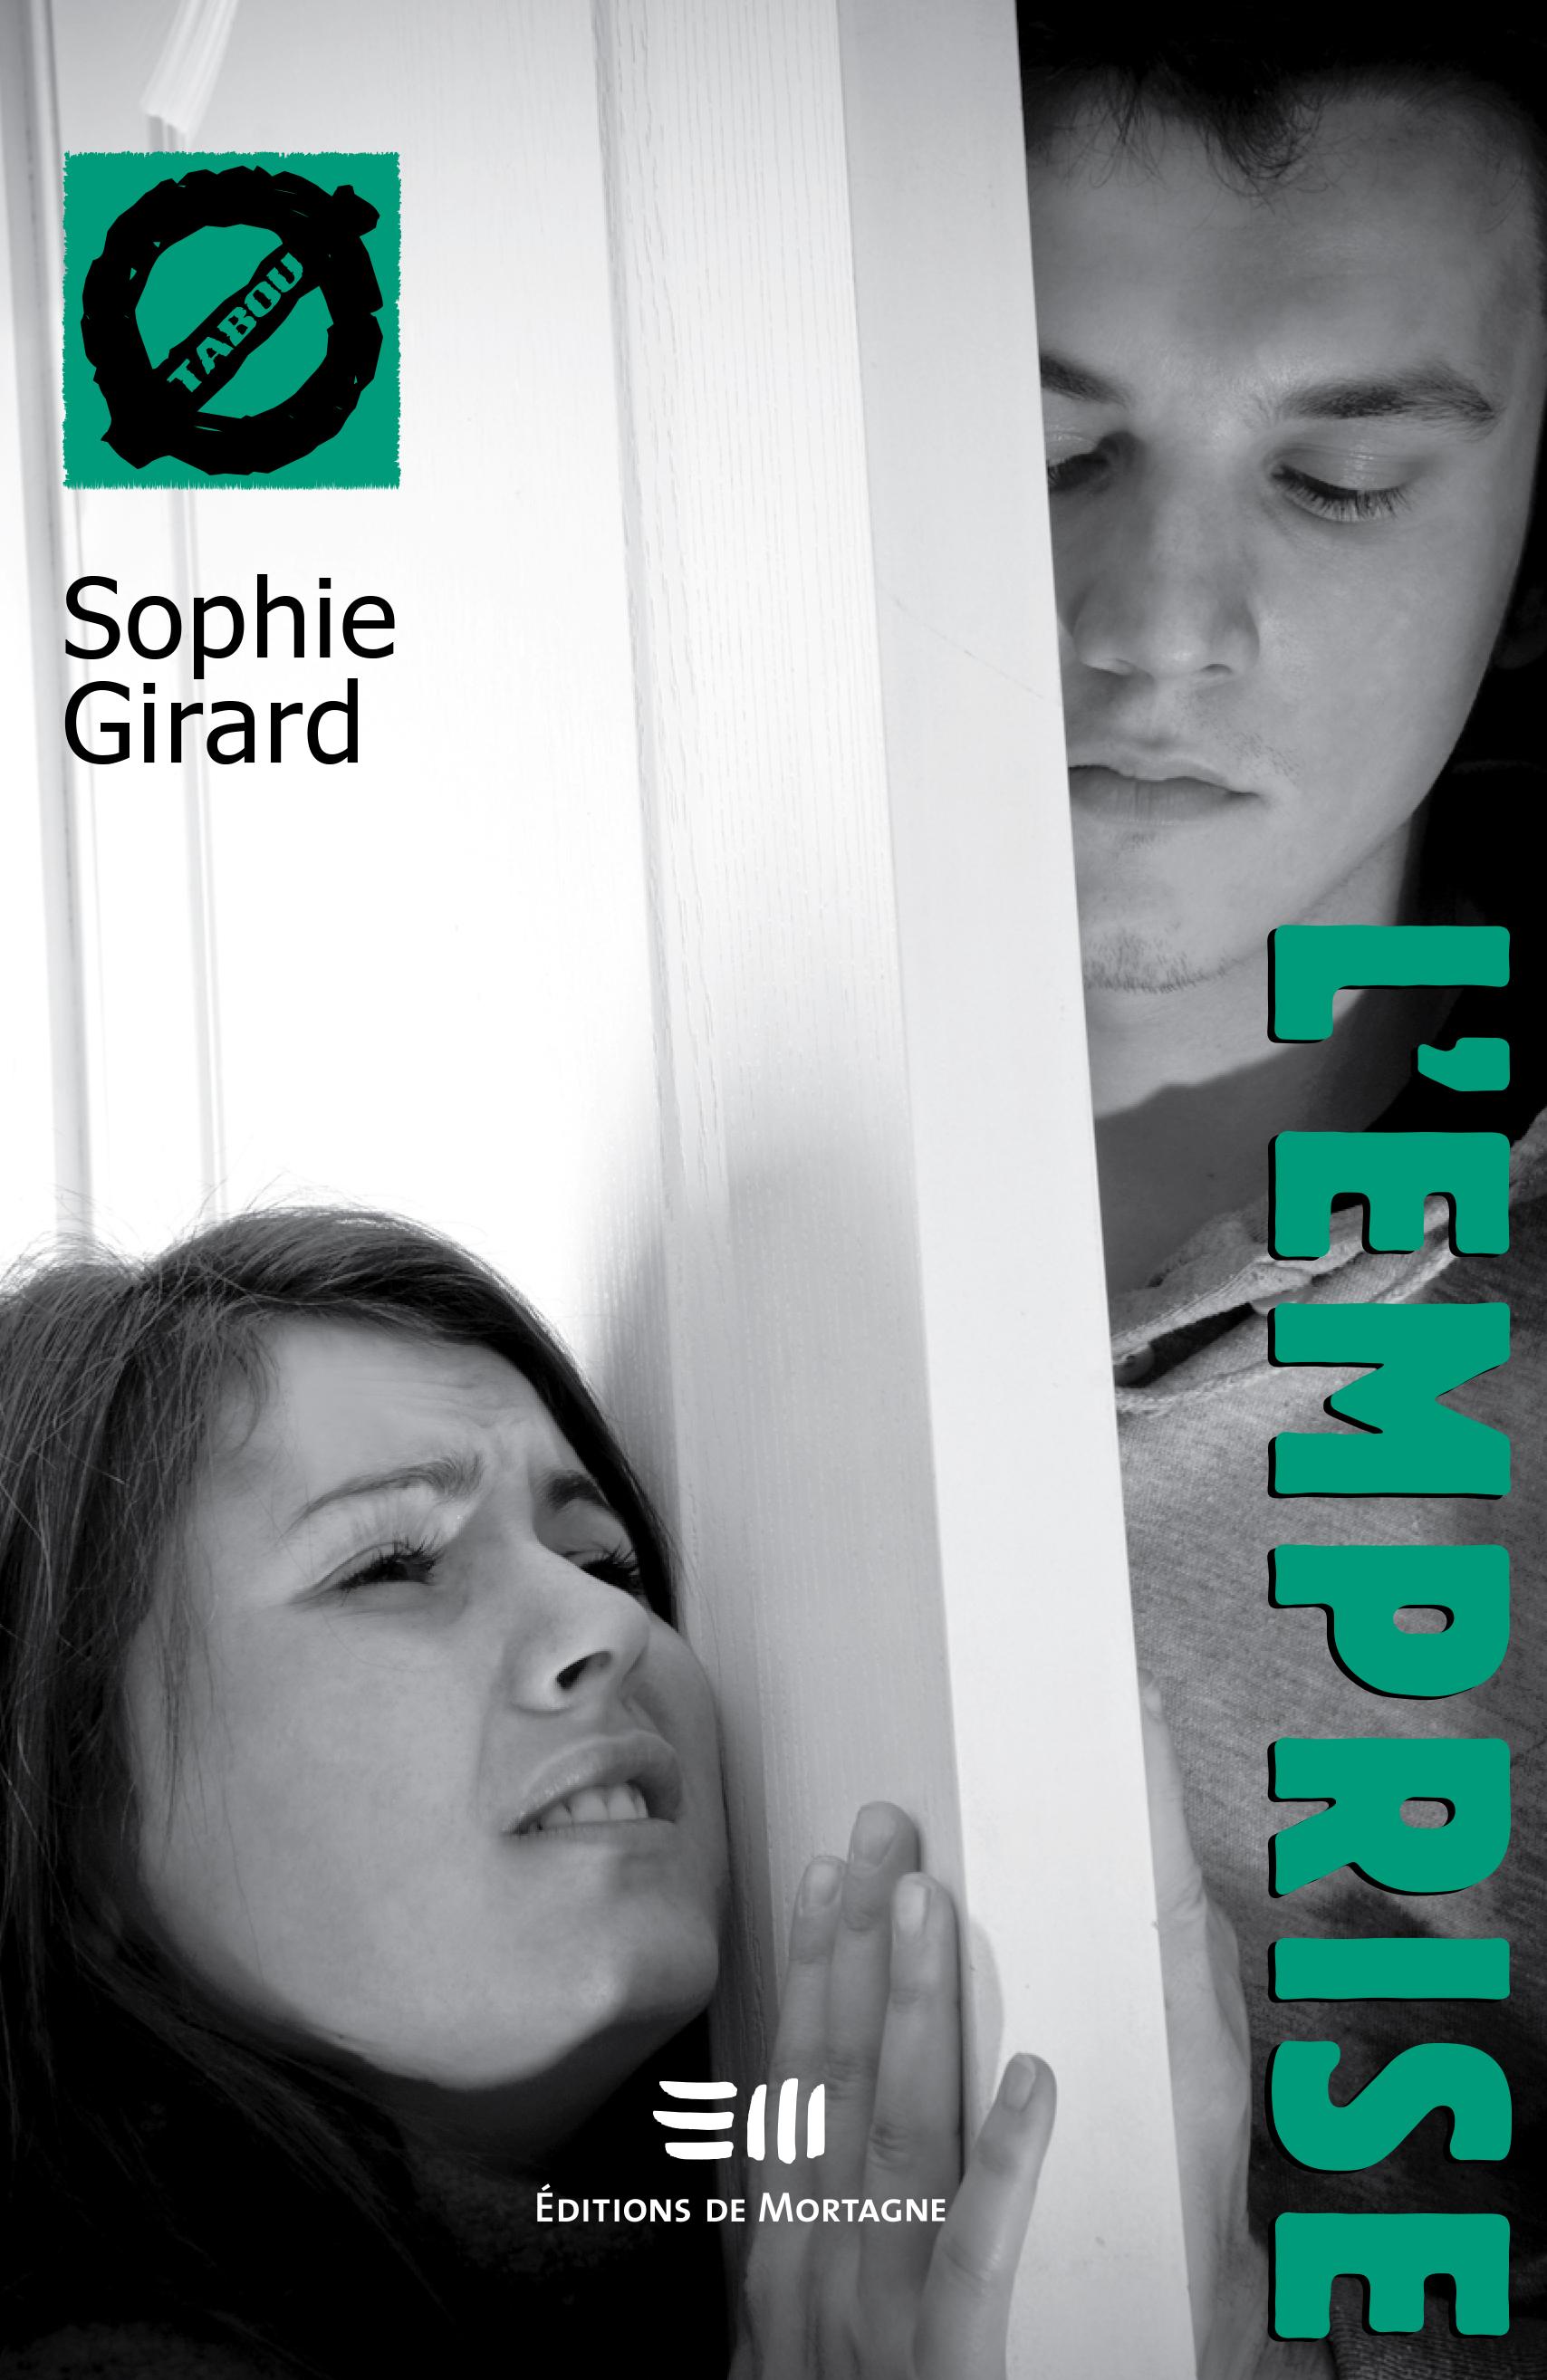 Couverture : Emprise (L') Sophie Girard